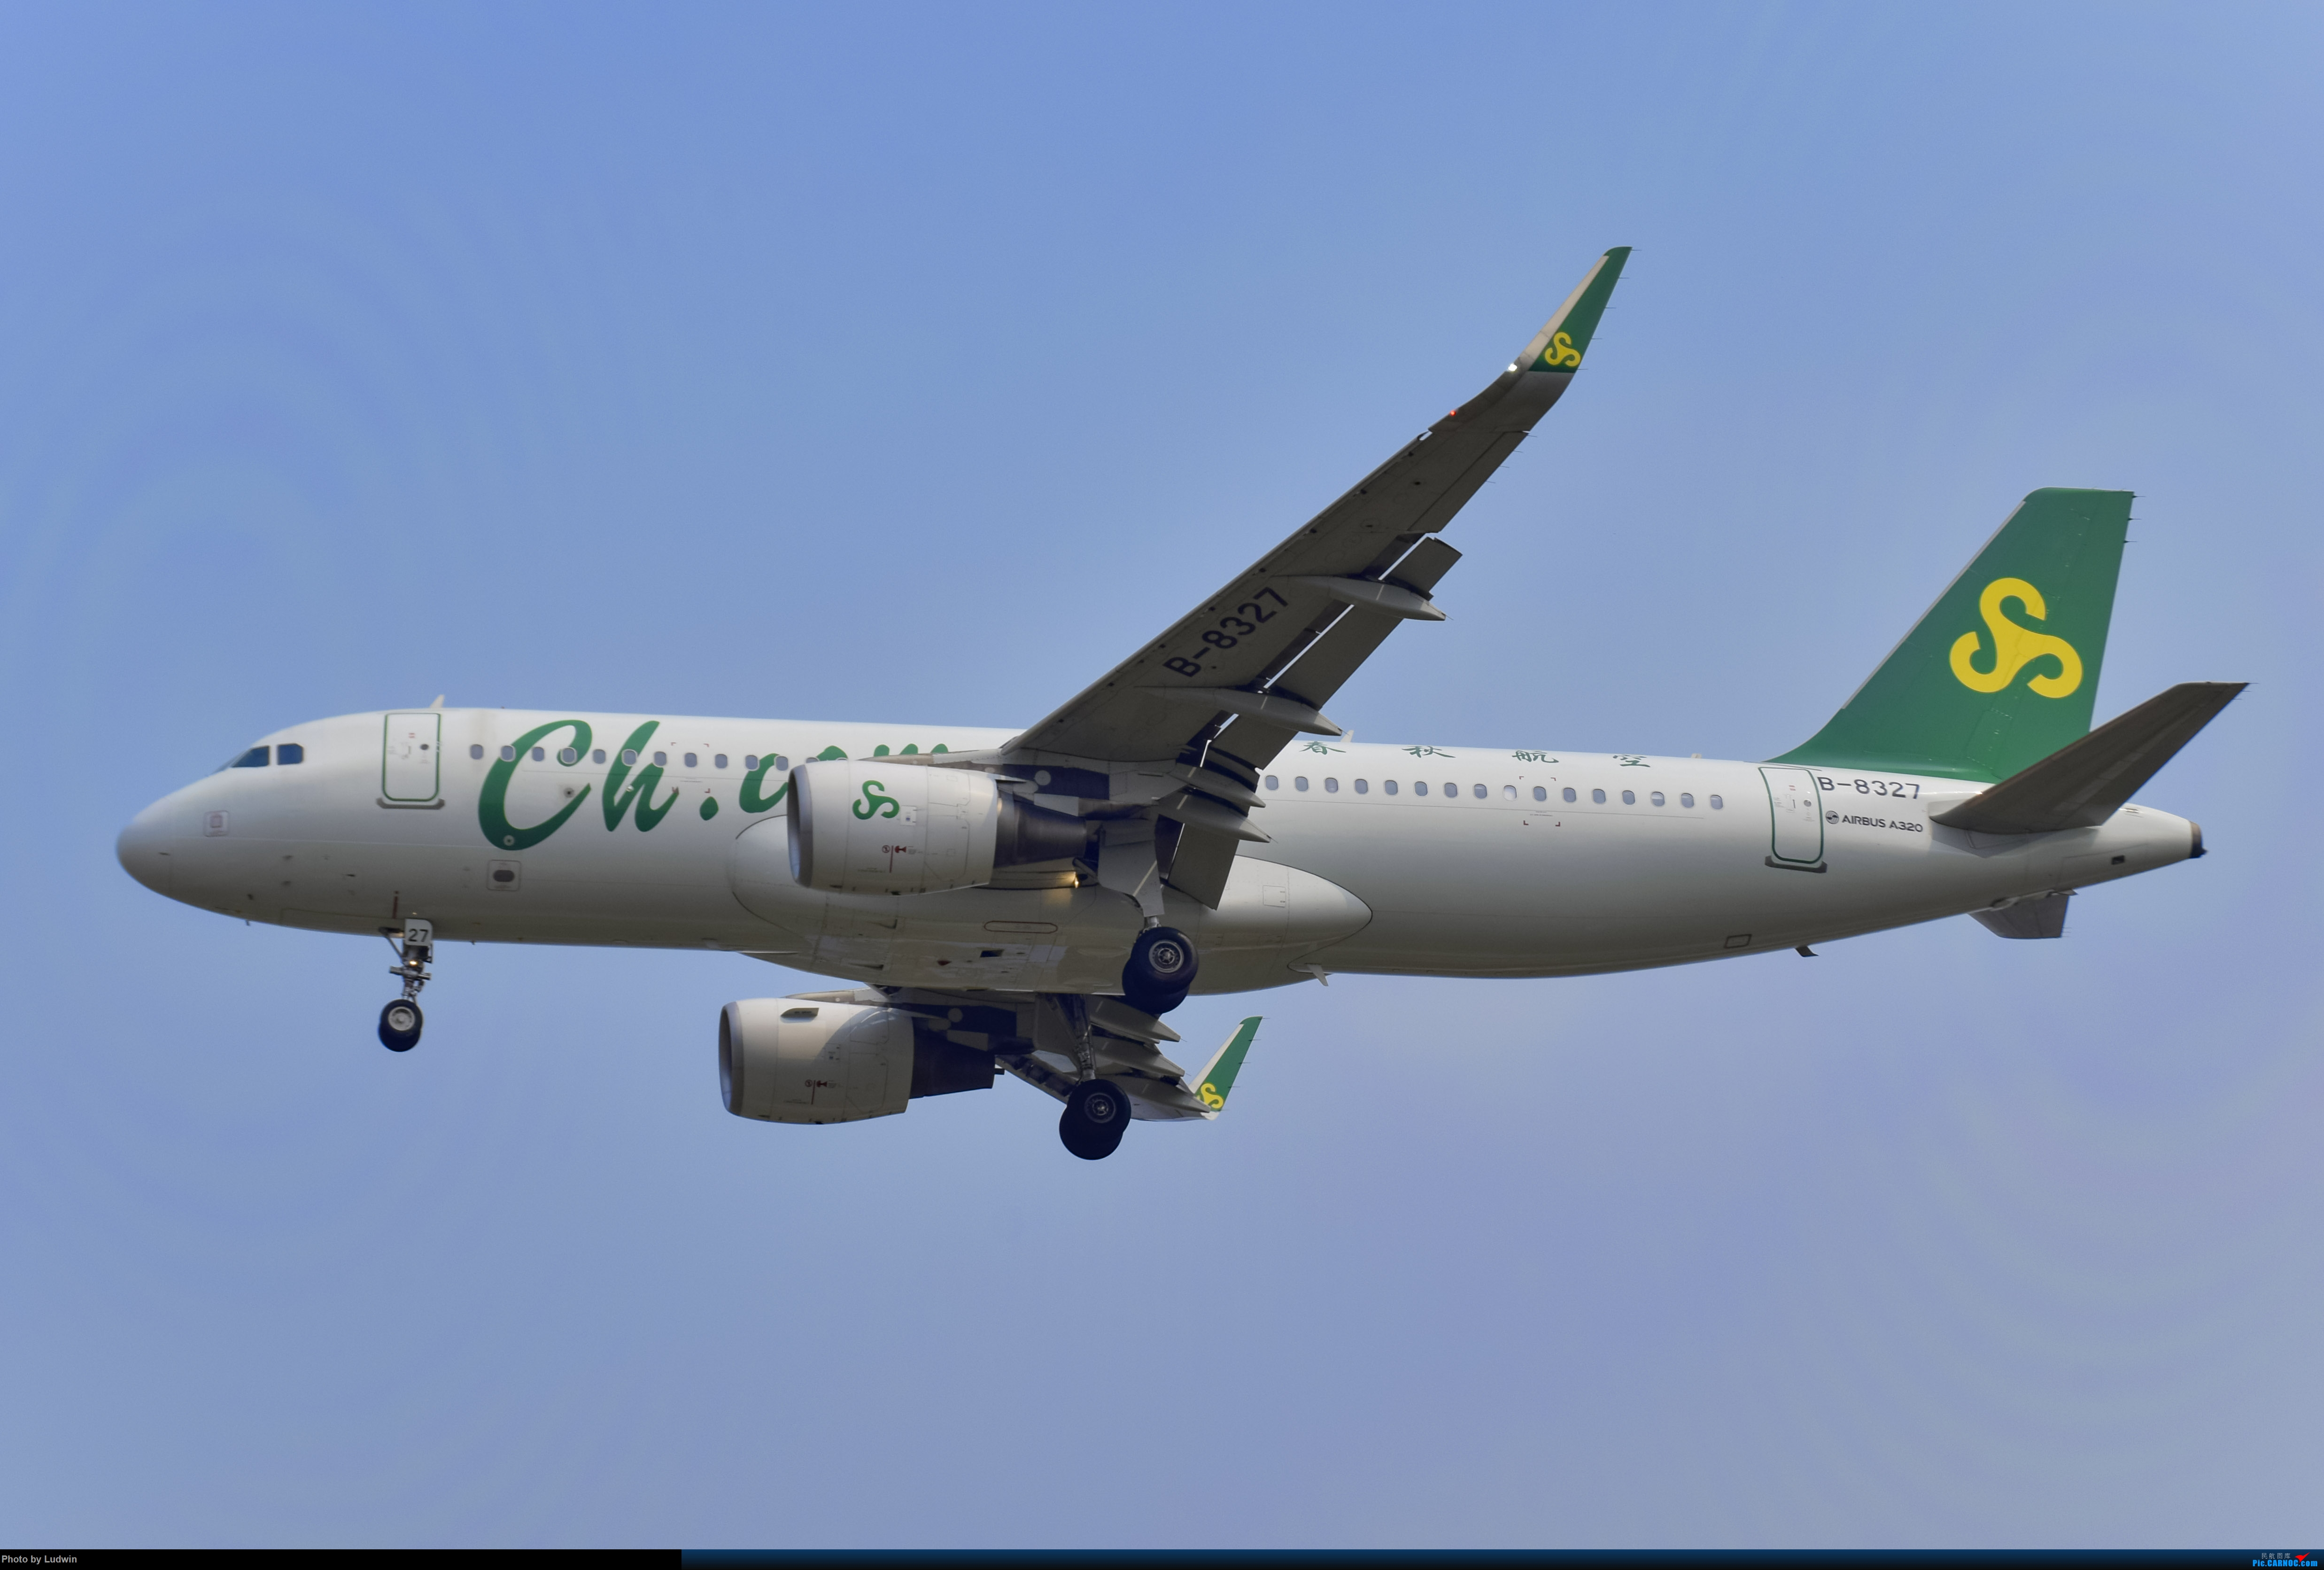 Re:[原创]没有地景系列 AIRBUS A320-200 B-8327 中国重庆江北国际机场